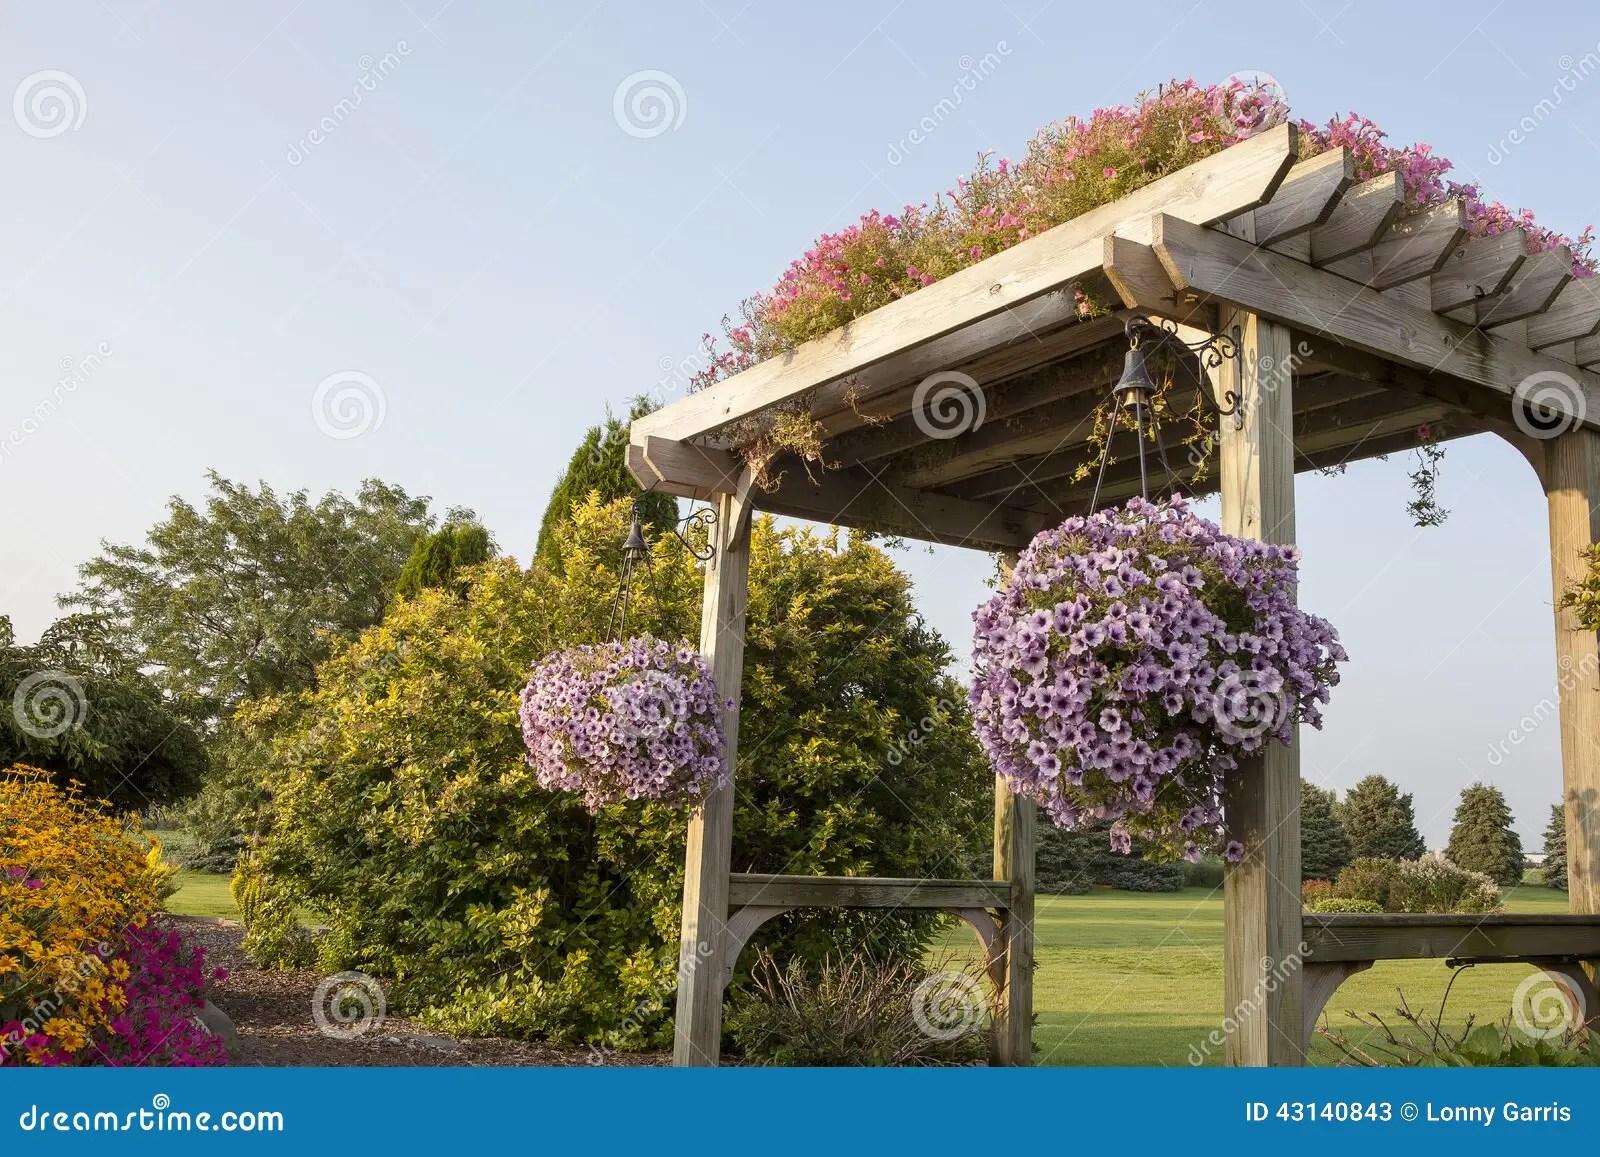 Garden Pergola With Walking Path Stock Image Image Of